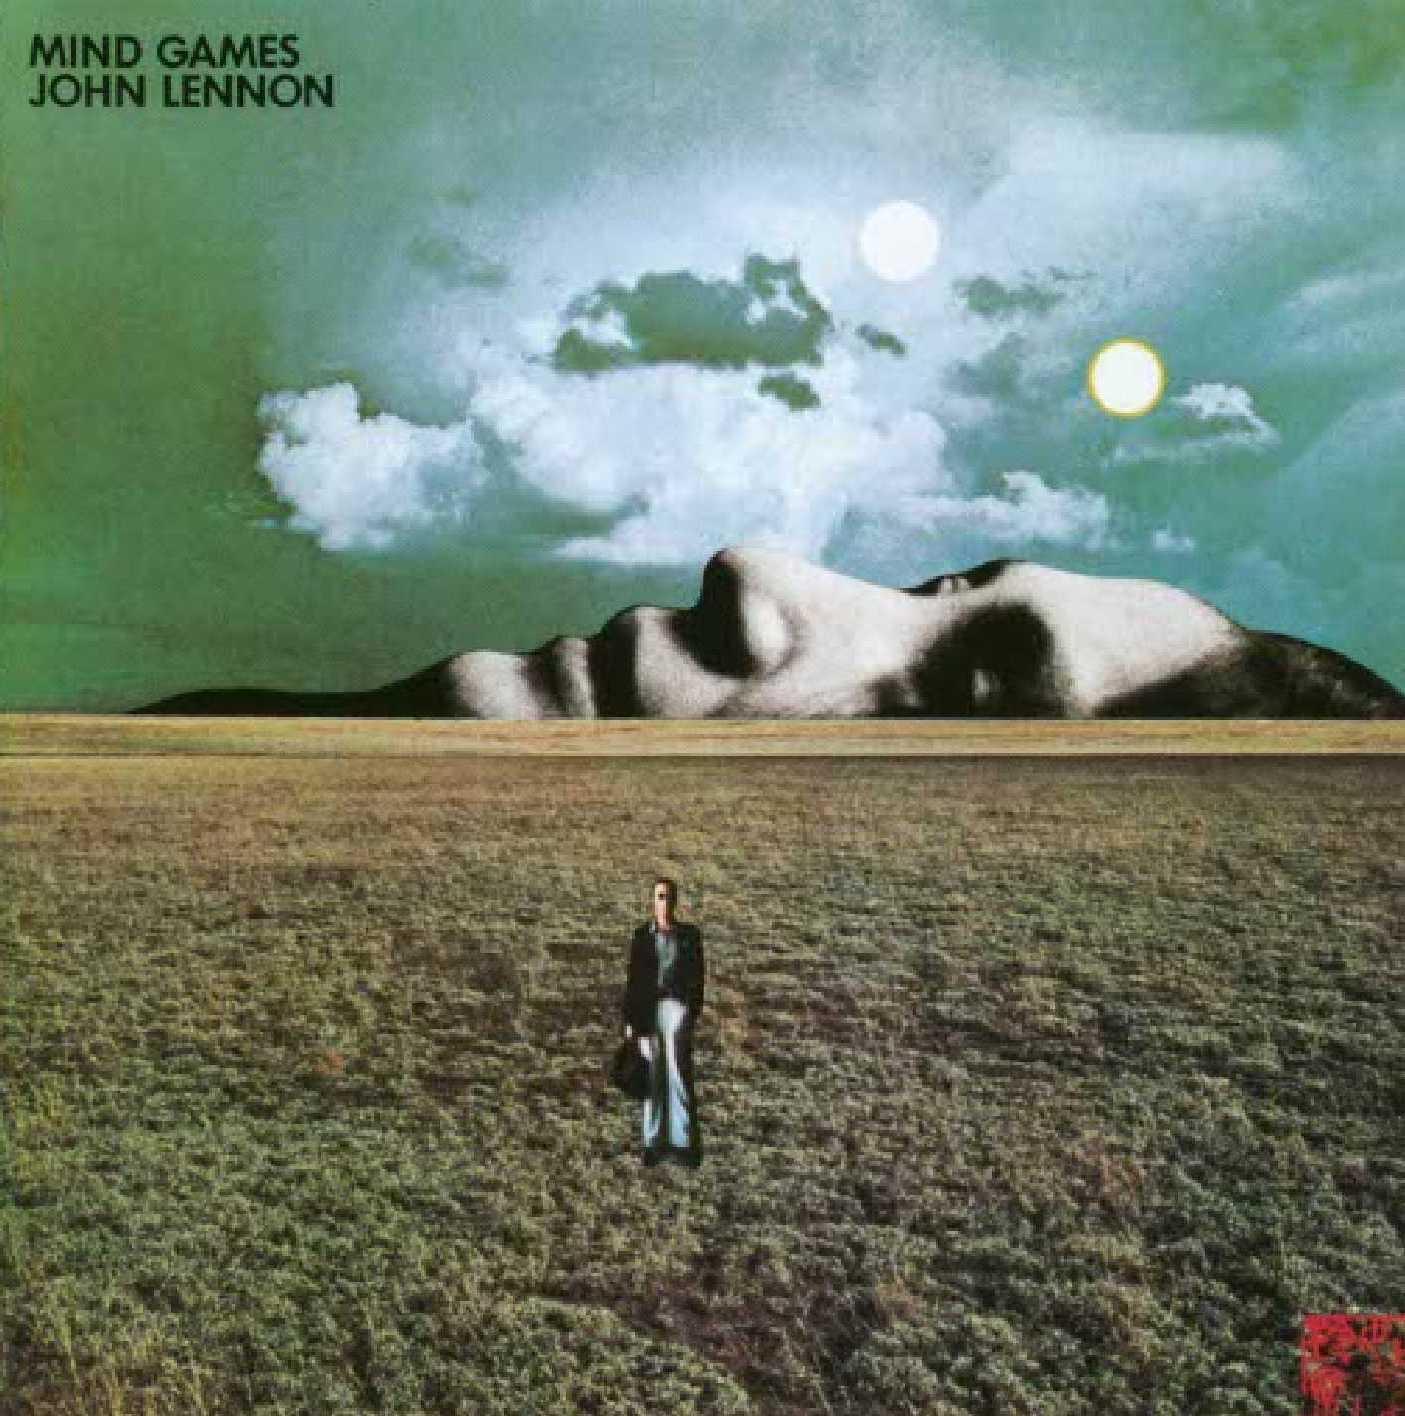 http://3.bp.blogspot.com/-r8ix9KCWtCk/UQSiytqNWfI/AAAAAAAAczM/TXDqSfDu6F8/s1600/John+Lennon+-+Mind+Games+-+Front.jpg